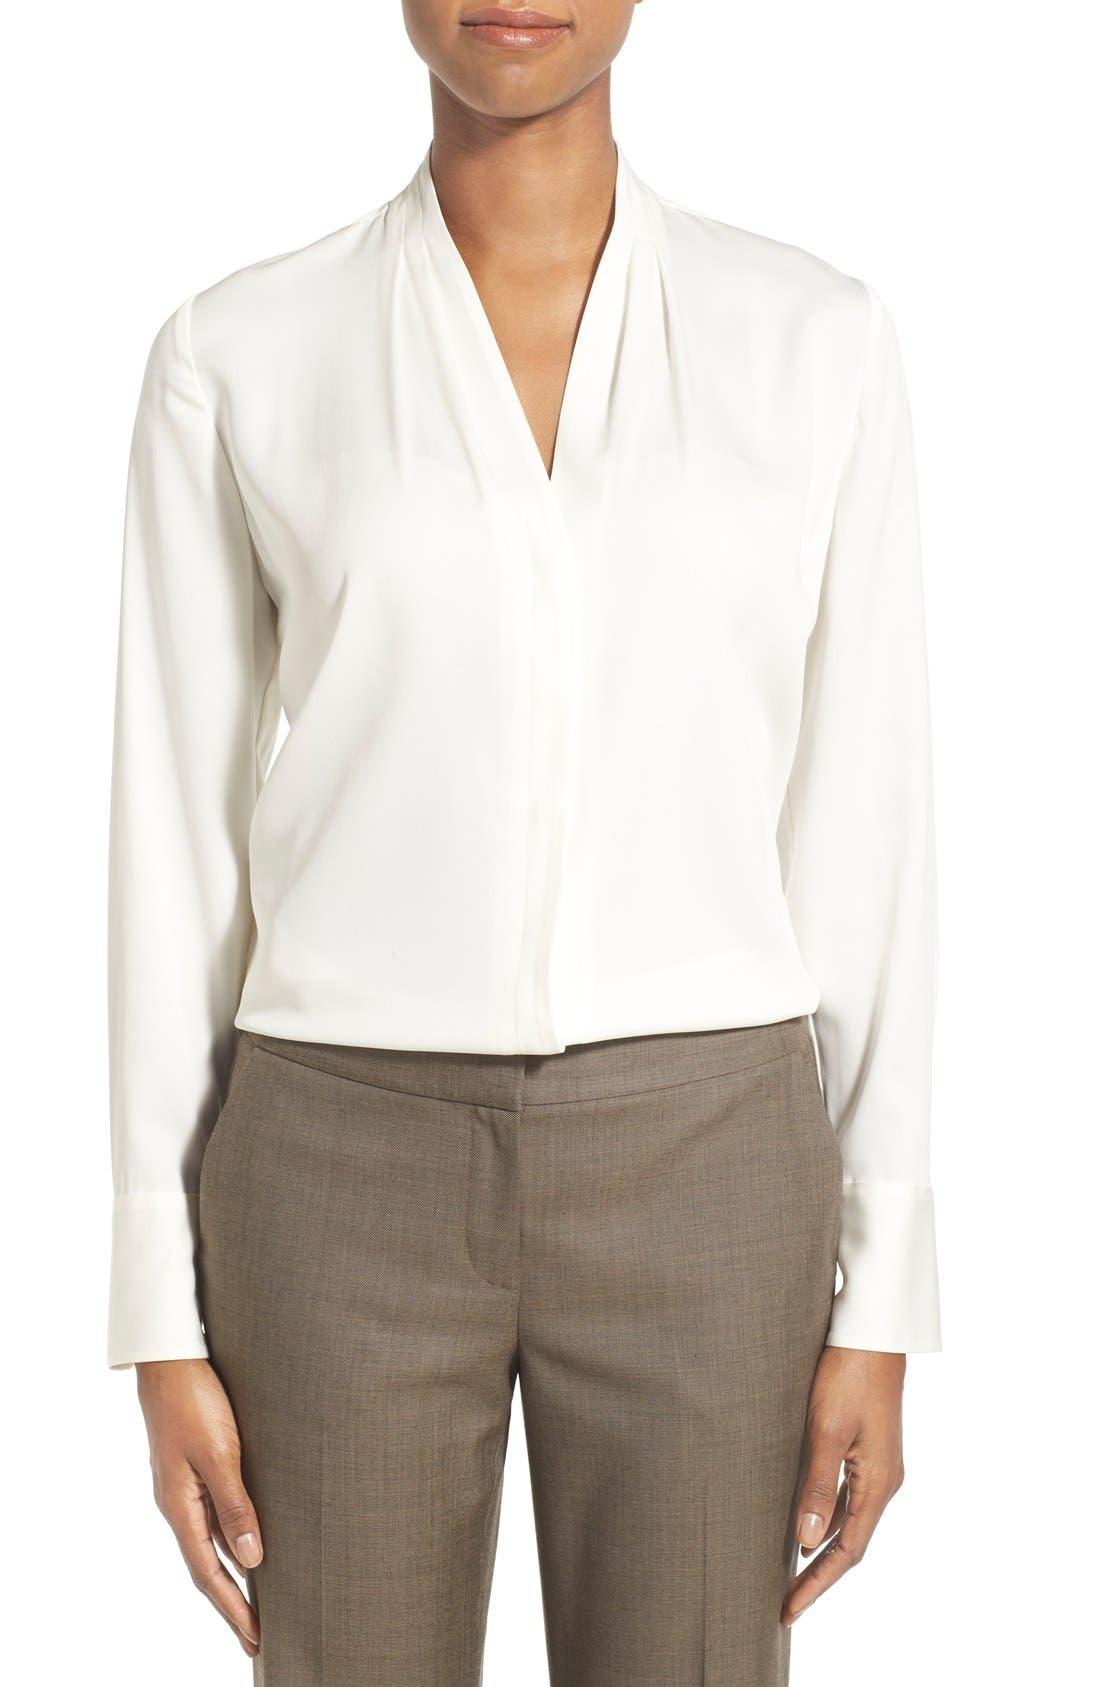 Alternate Image 1 Selected - Classiques Entier® Pleat V-Neck Stretch Silk Blouse (Regular & Petite)